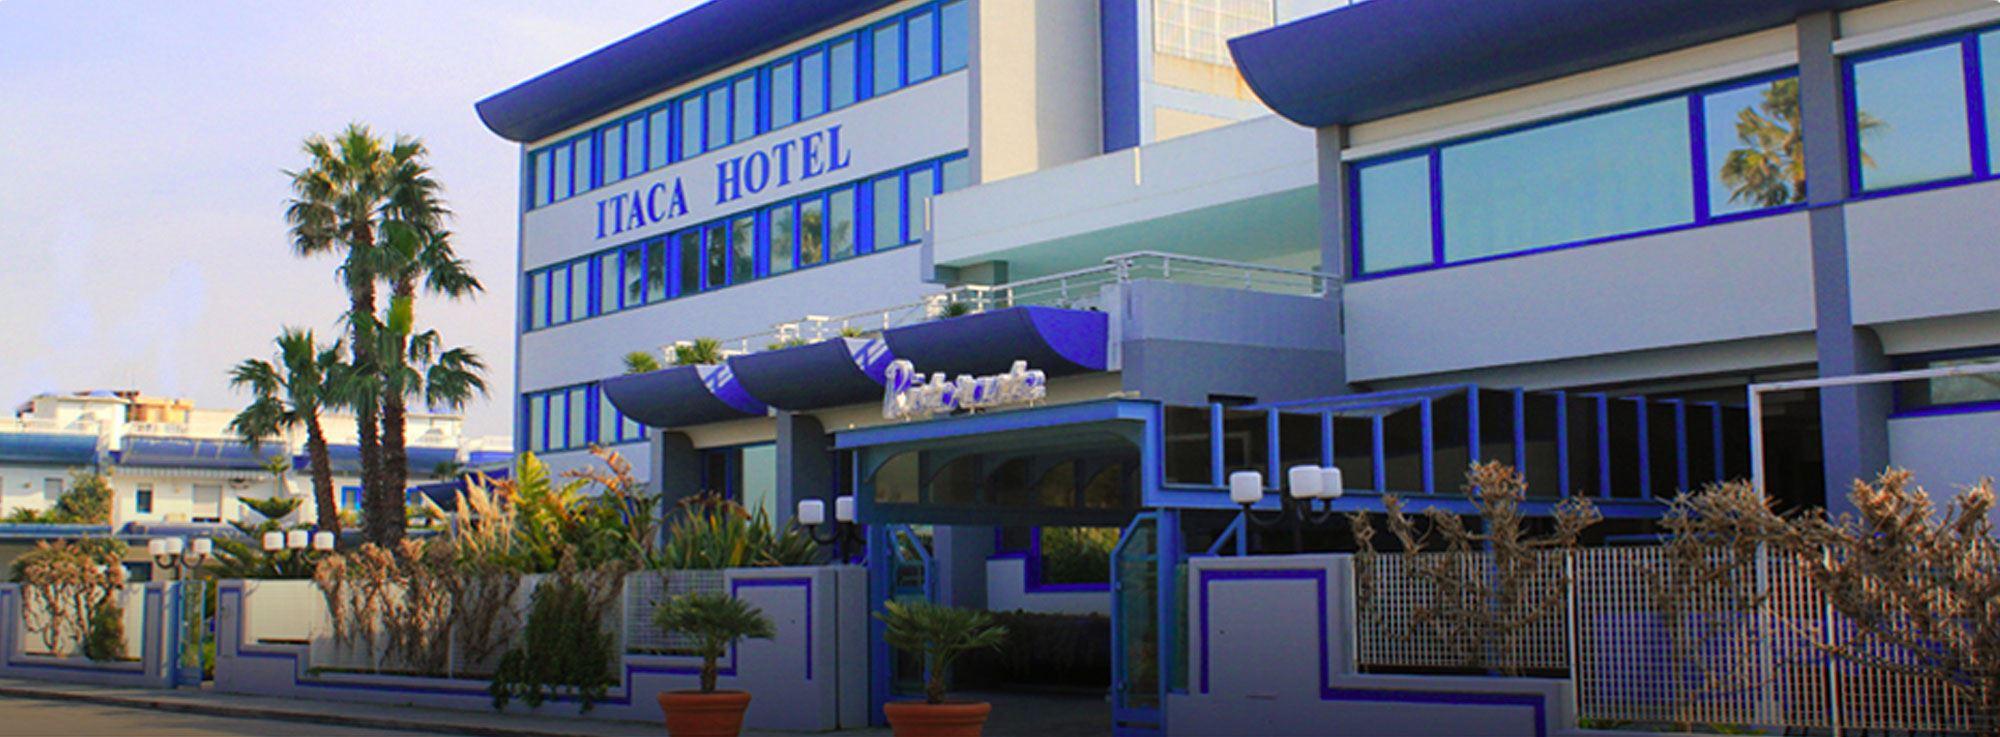 Itaca Hotel Barletta